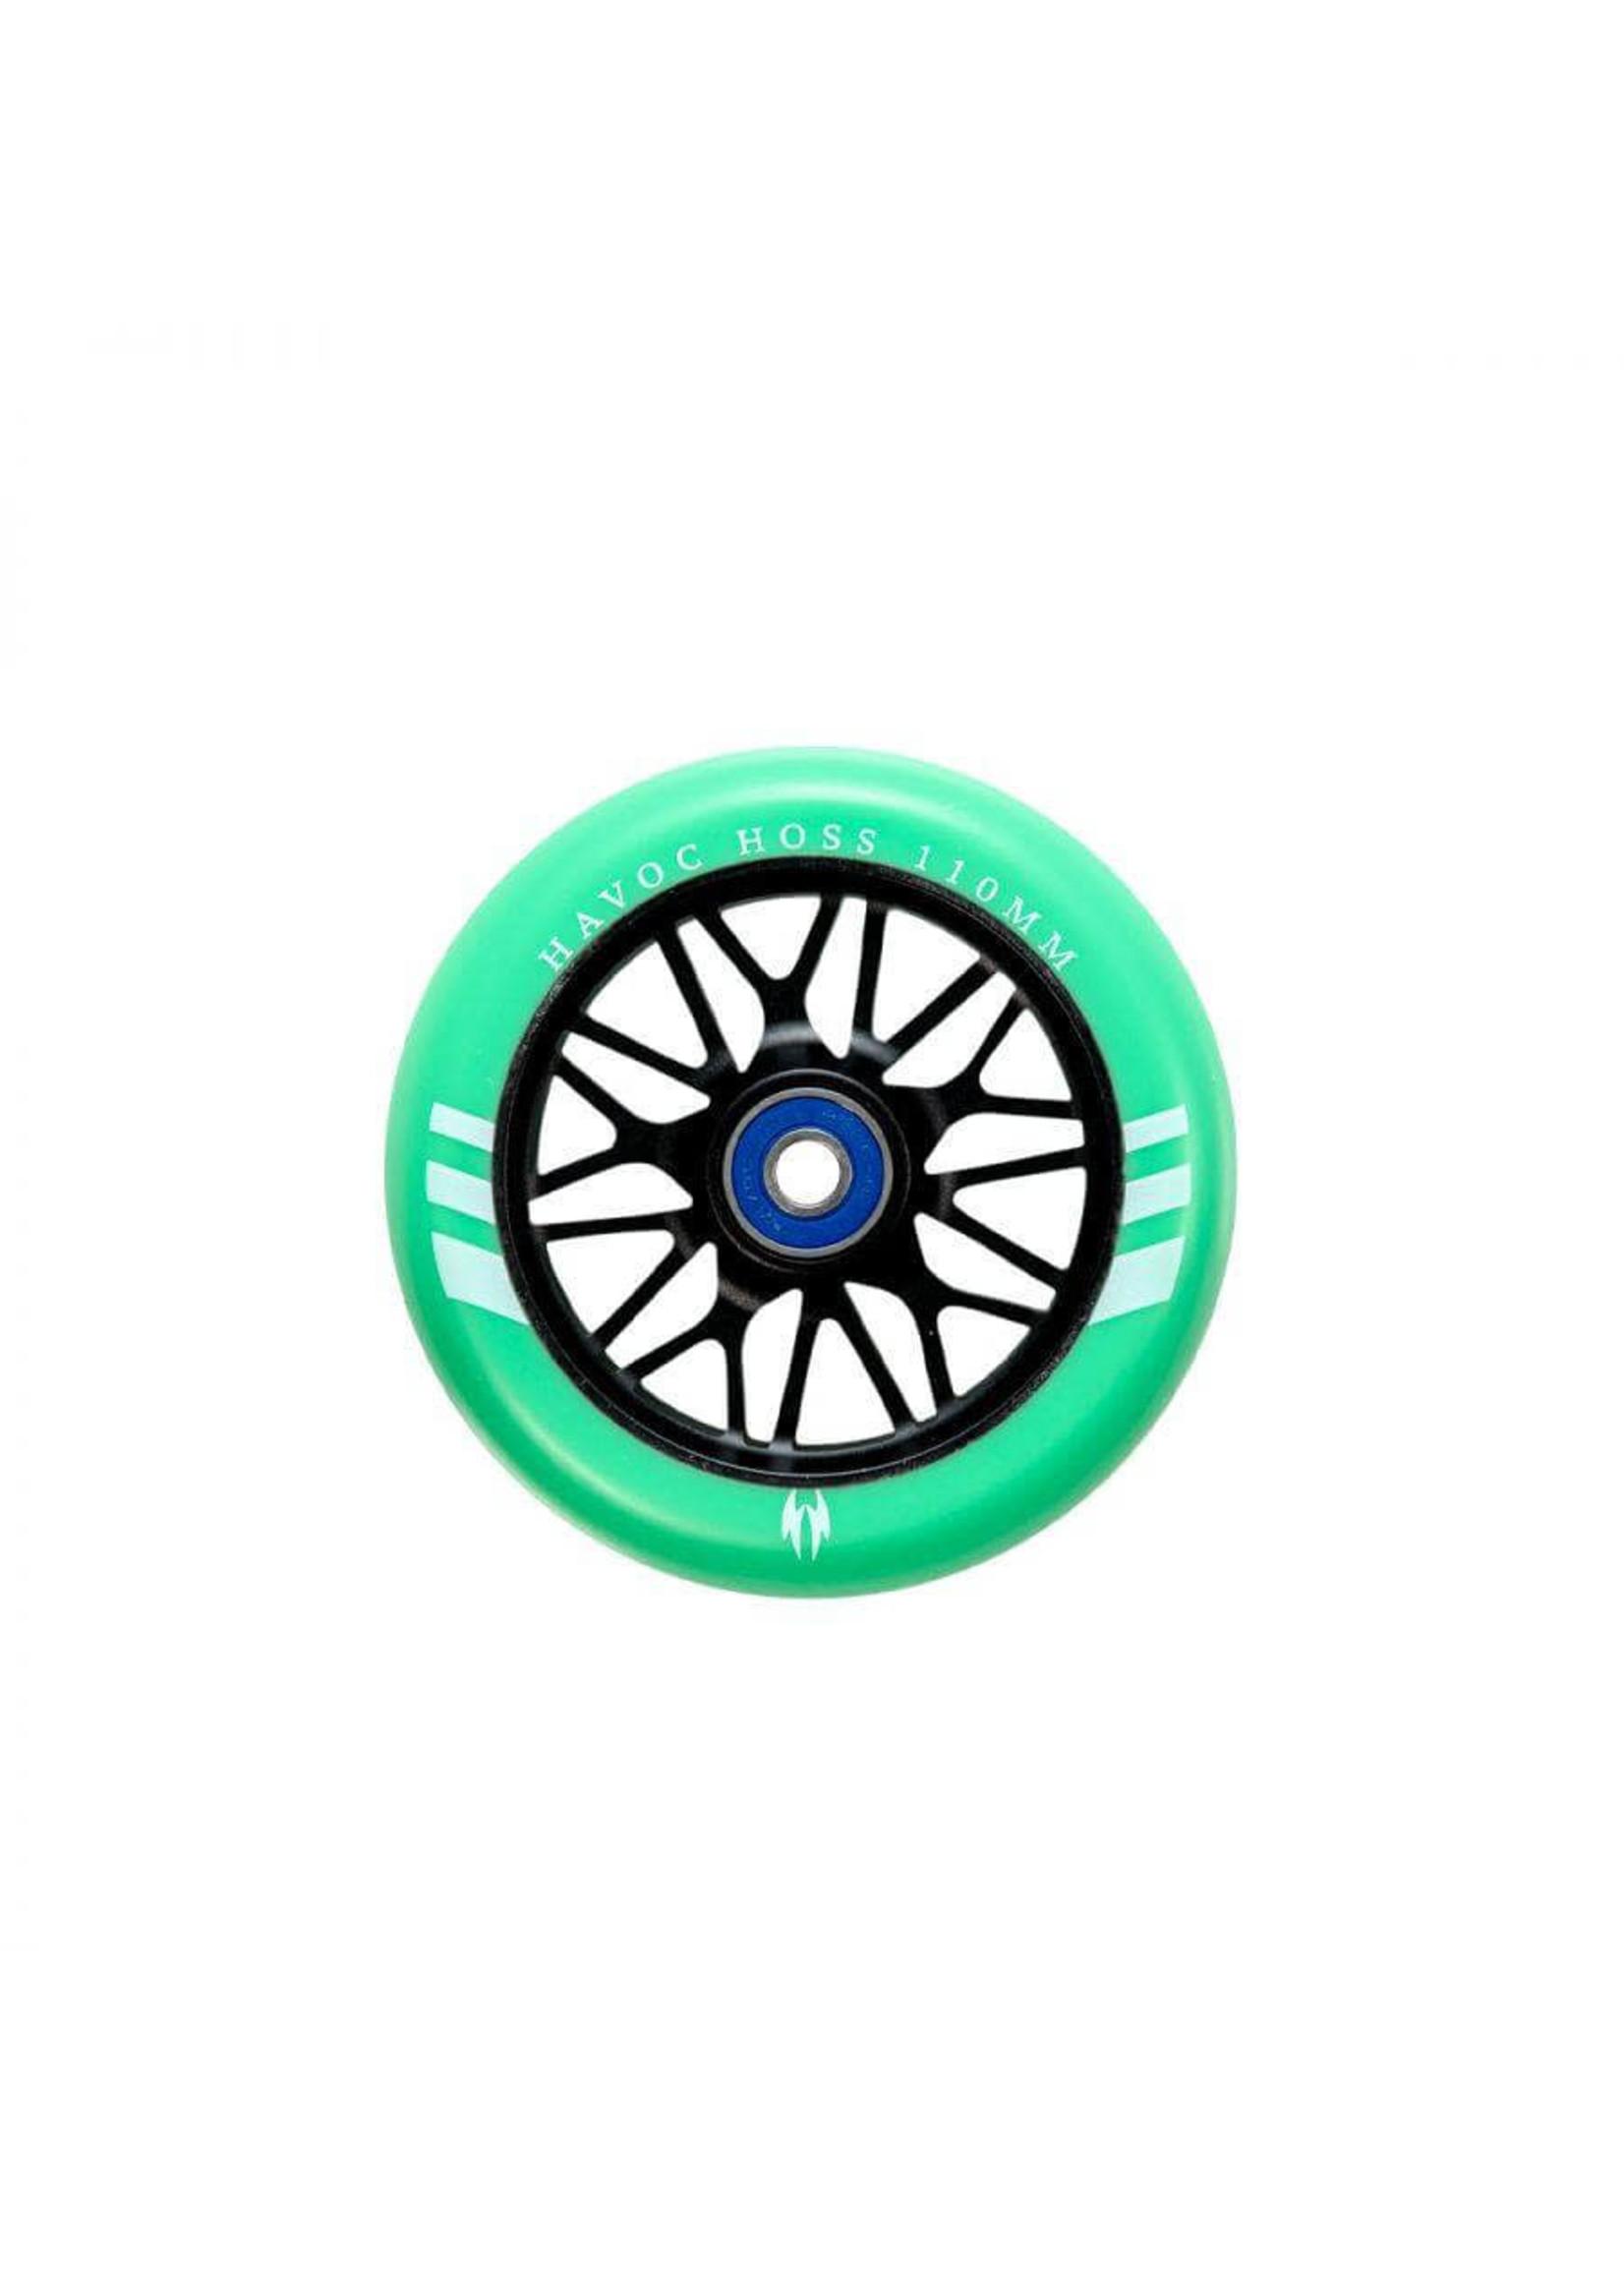 Havoc Havoc - Hoss Wheels - 110mm